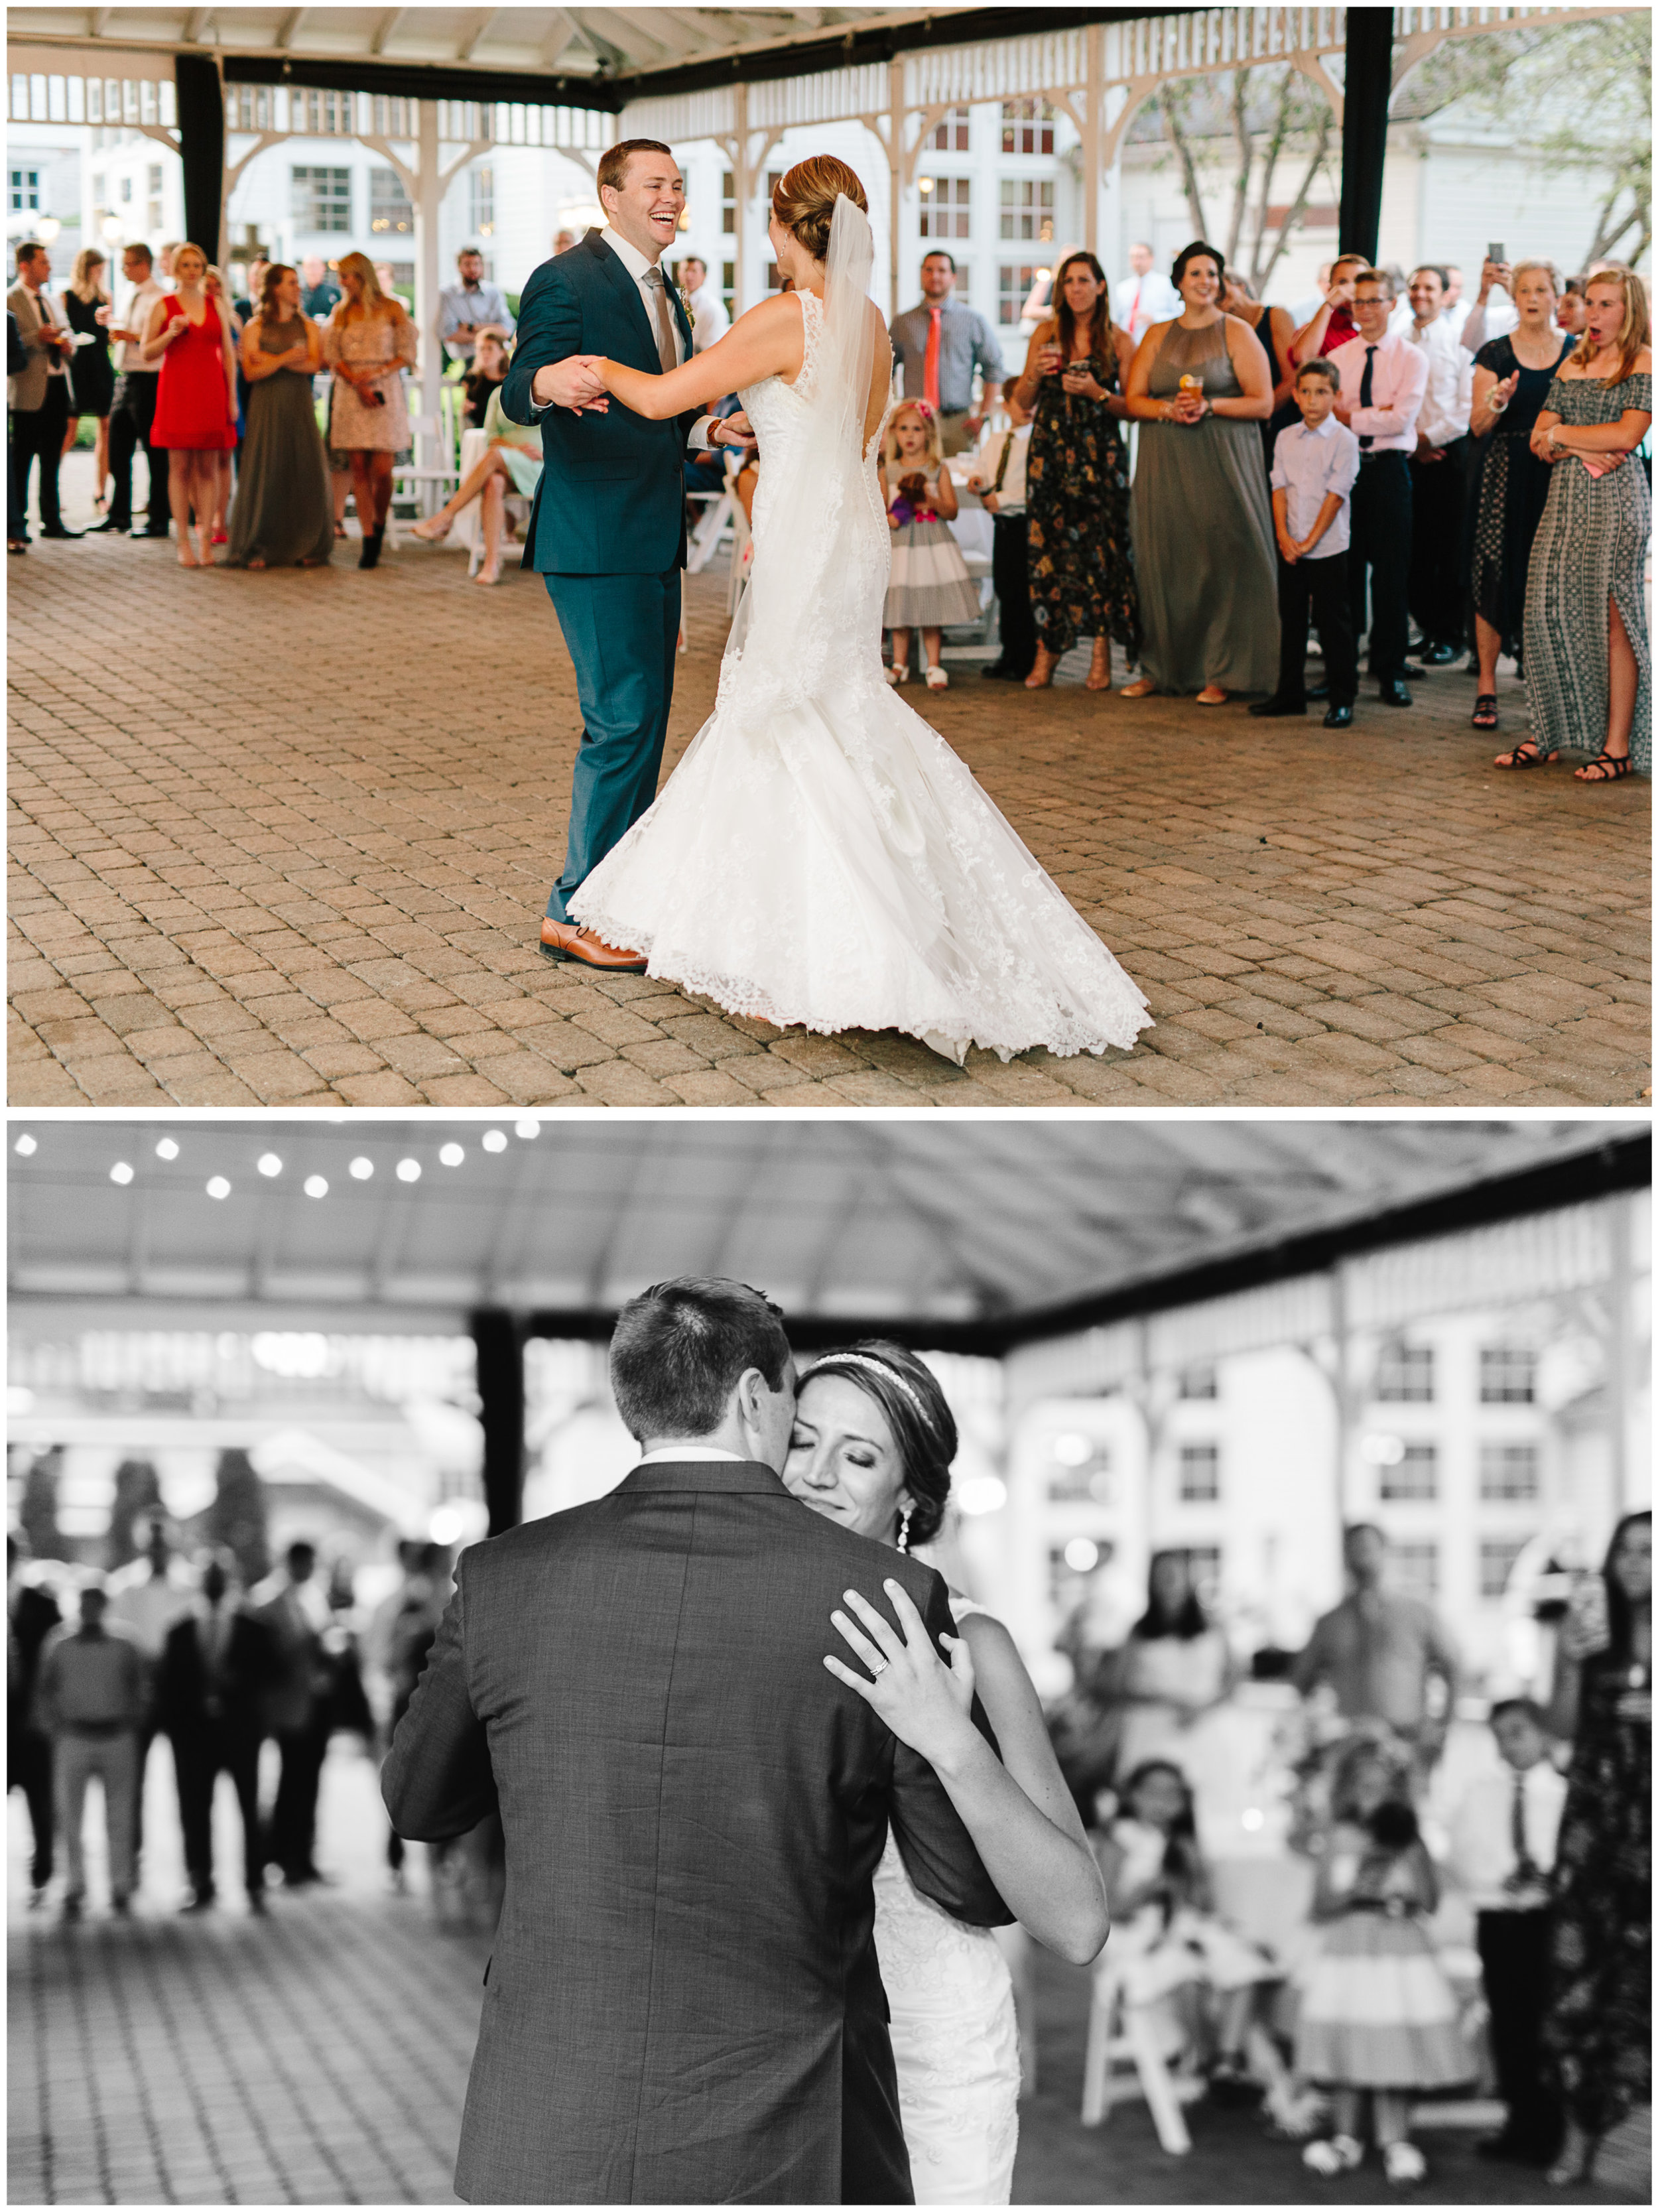 ann_arbor_michigan_wedding_89.jpg